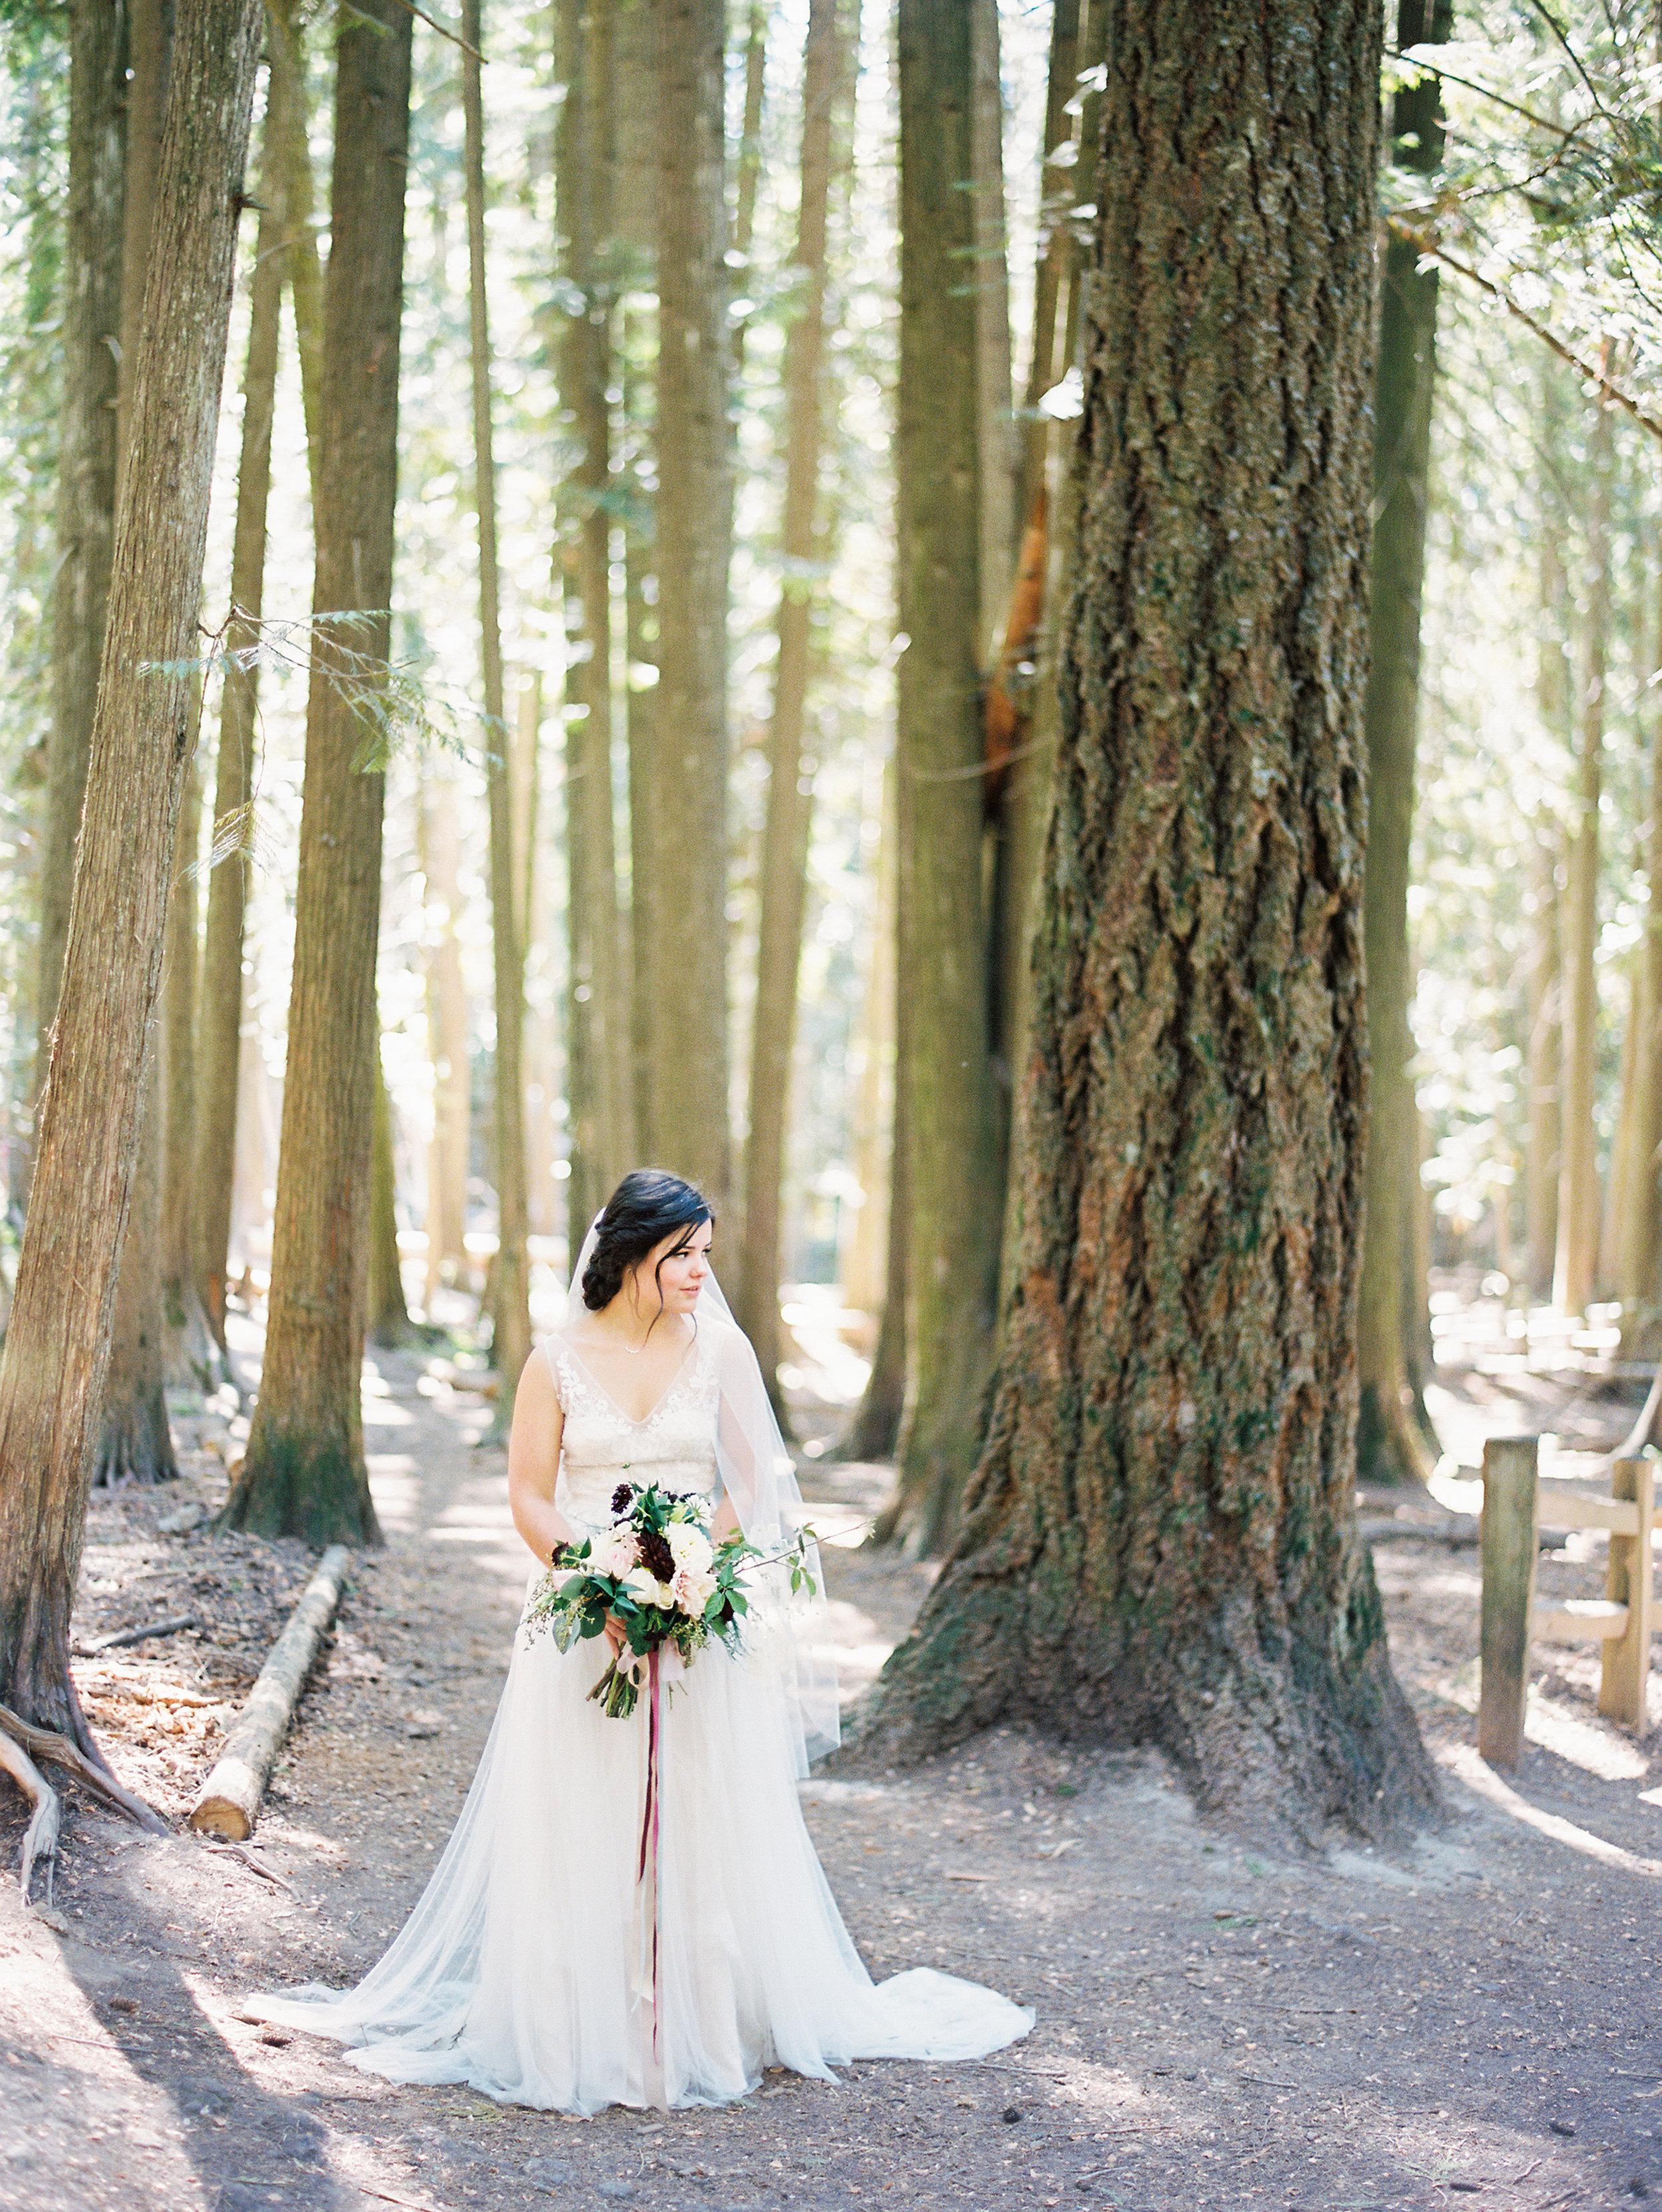 Idaho-Field-Forest-Wedding-Film-Photographer-Kristina-Adams-170 (2).jpg